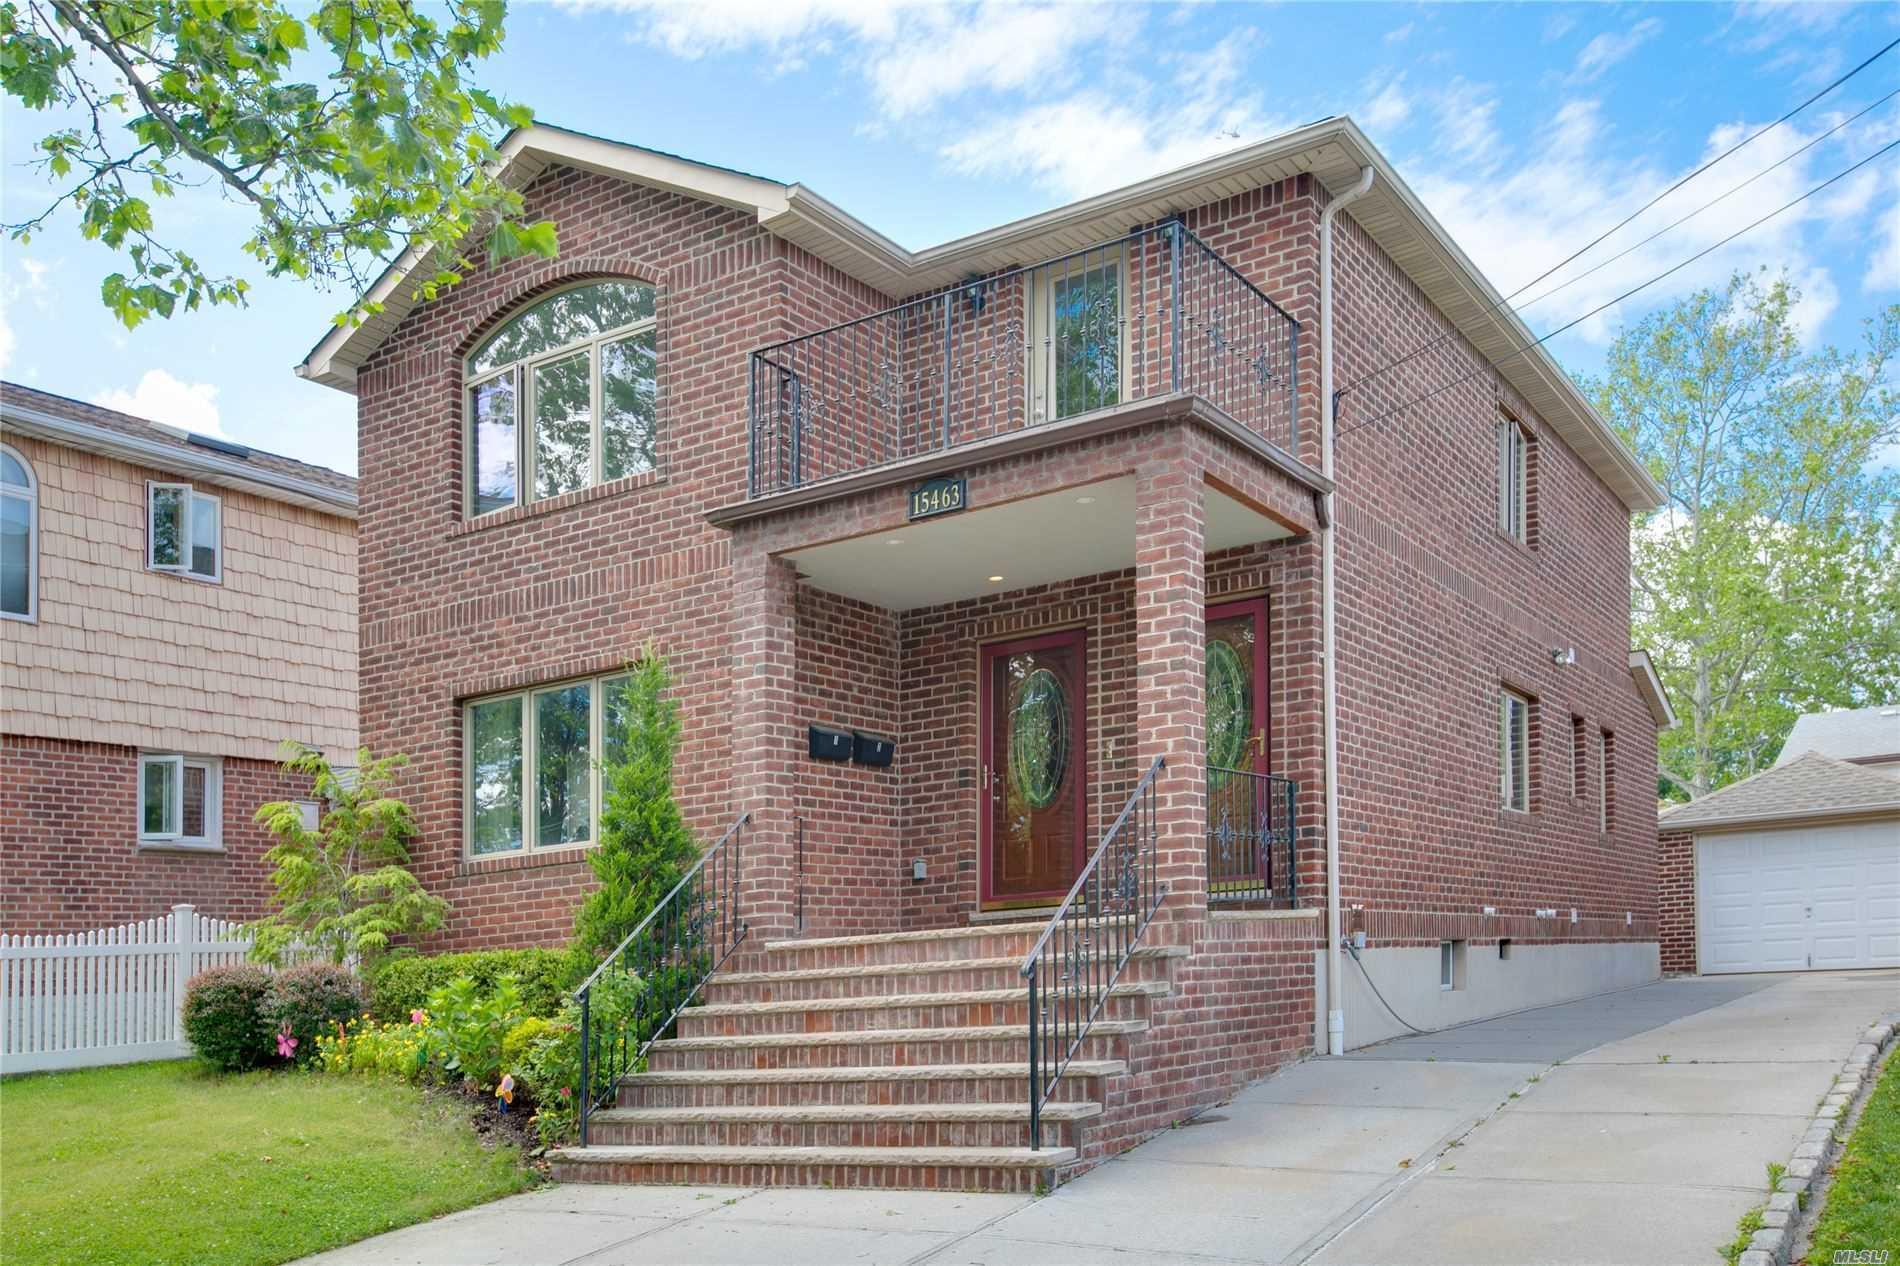 Property for sale at 154-63 Willets Point Boulevard, Whitestone NY 11357, Whitestone,  New York 11357